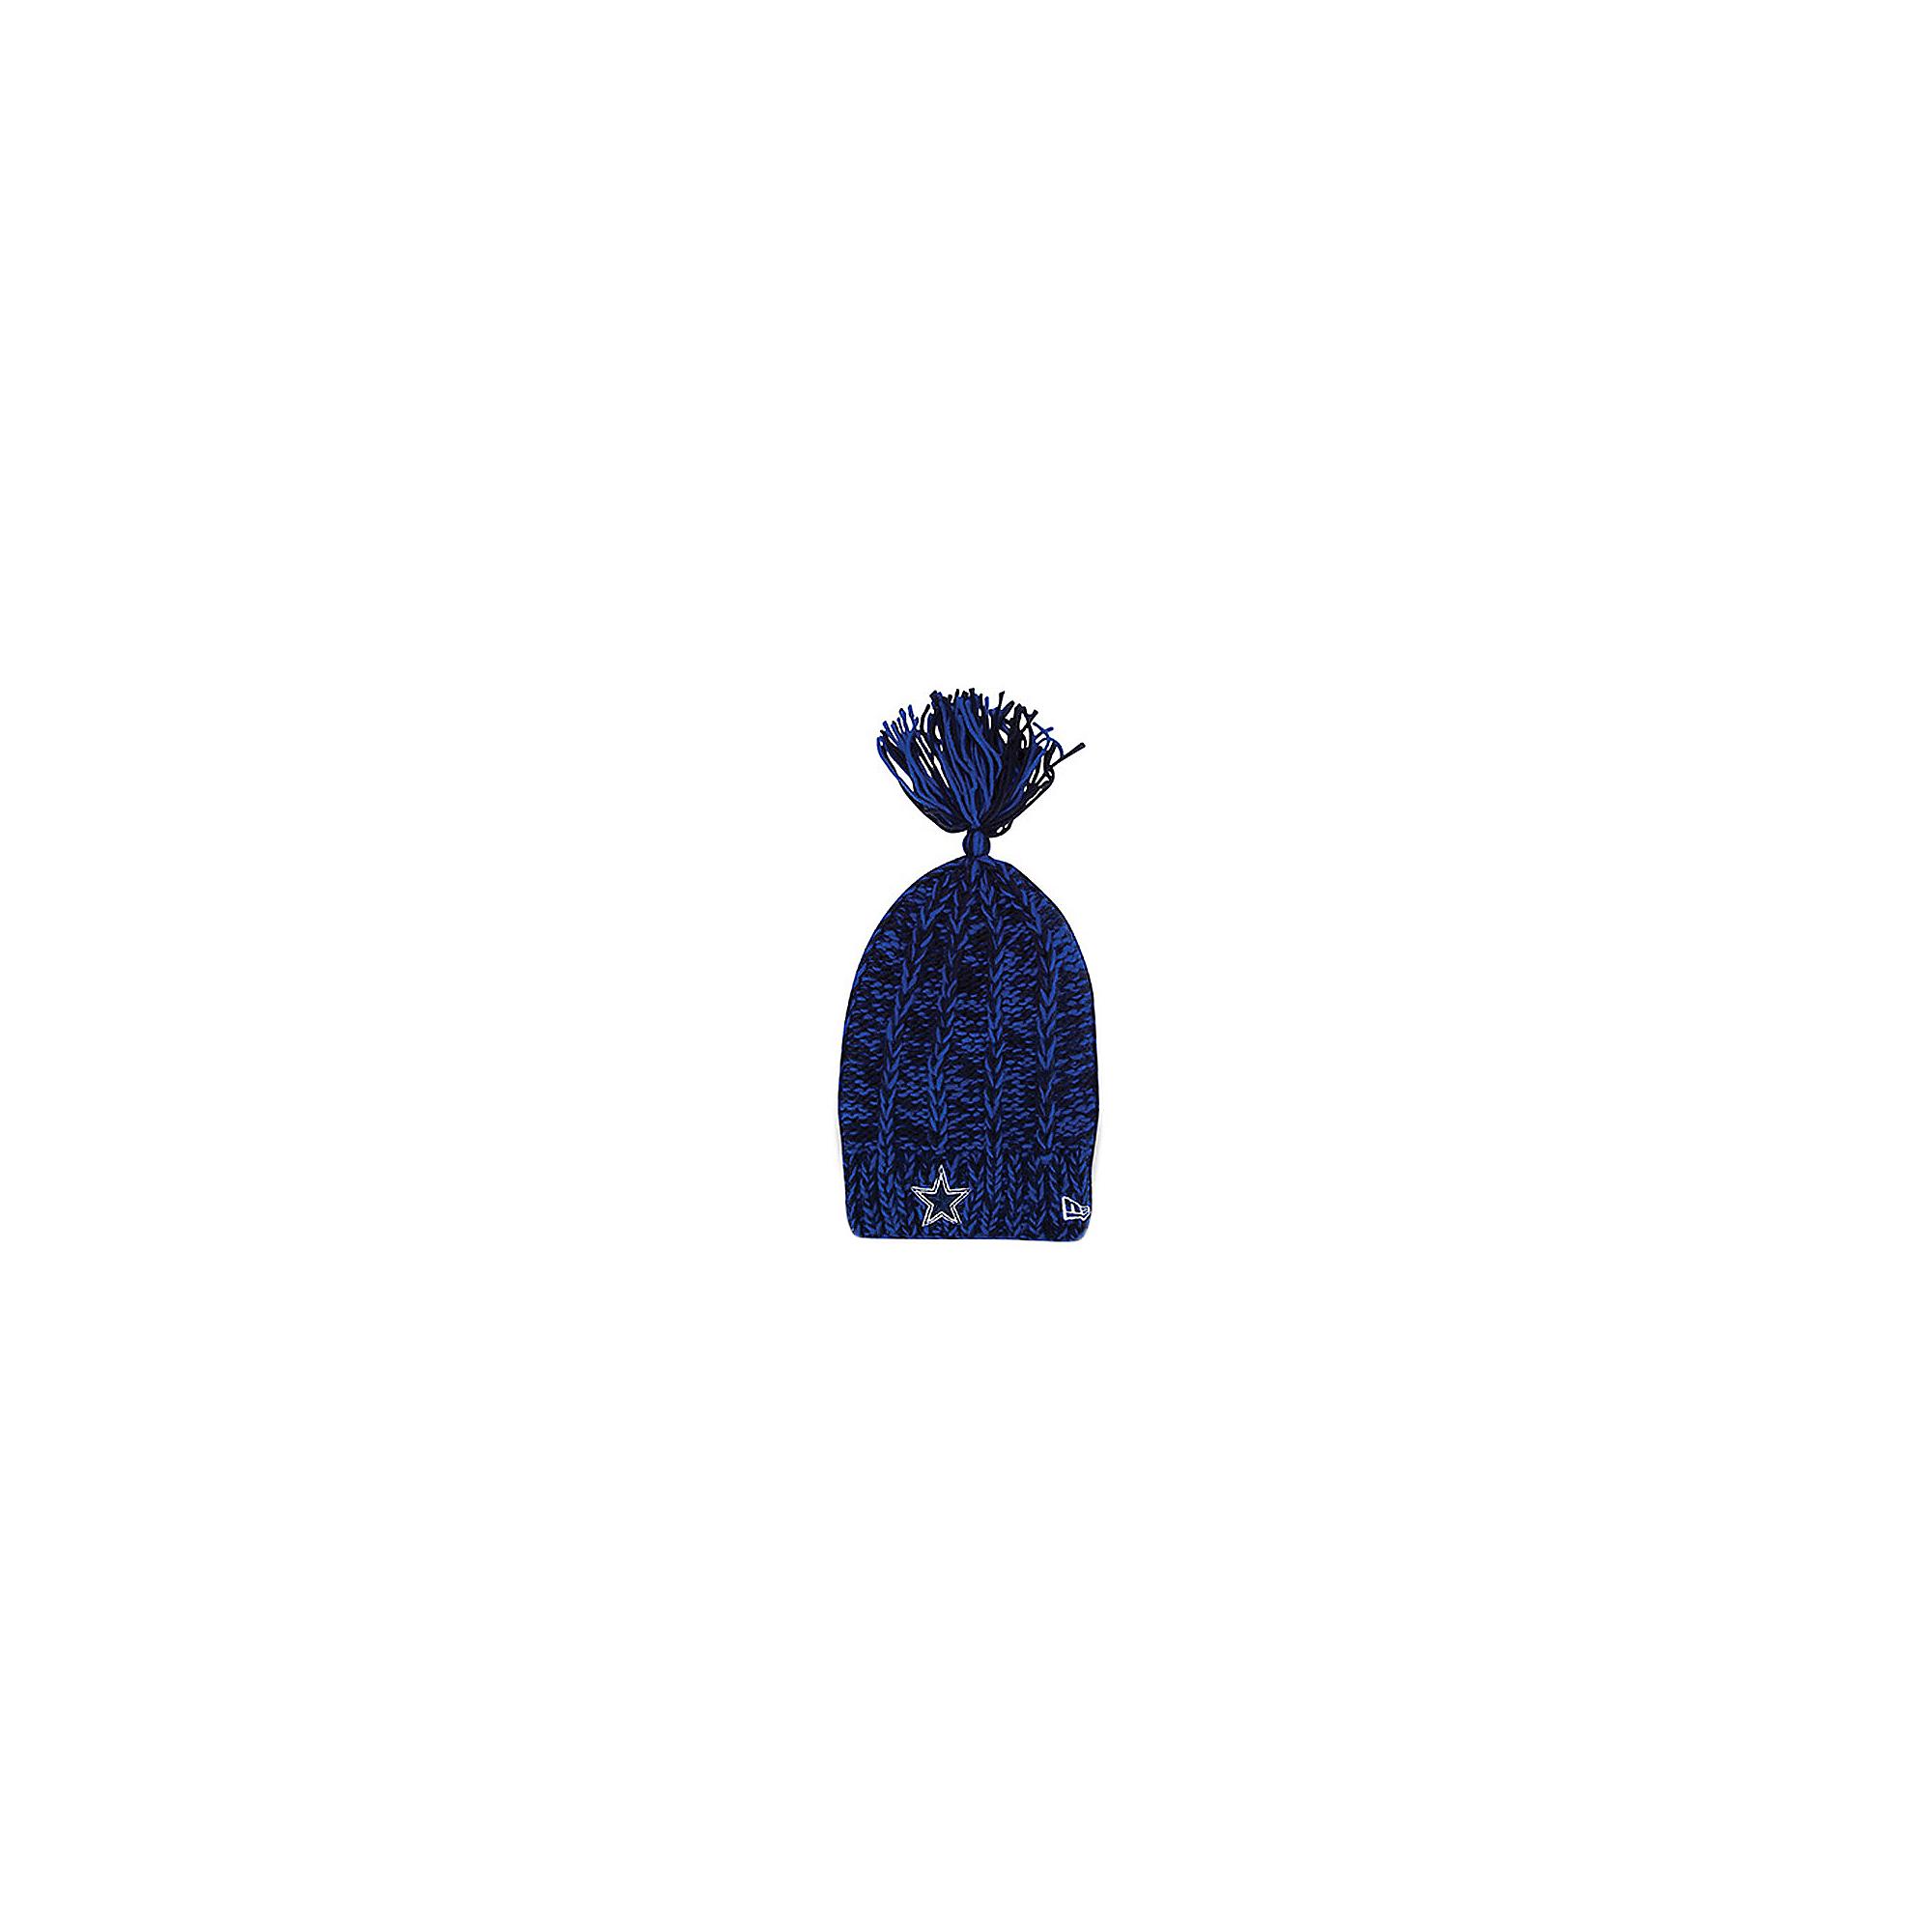 83a21ae9 Dallas Cowboys New Era Ladies Winter Slouch Knit Cap | Dallas Cowboys Pro  Shop